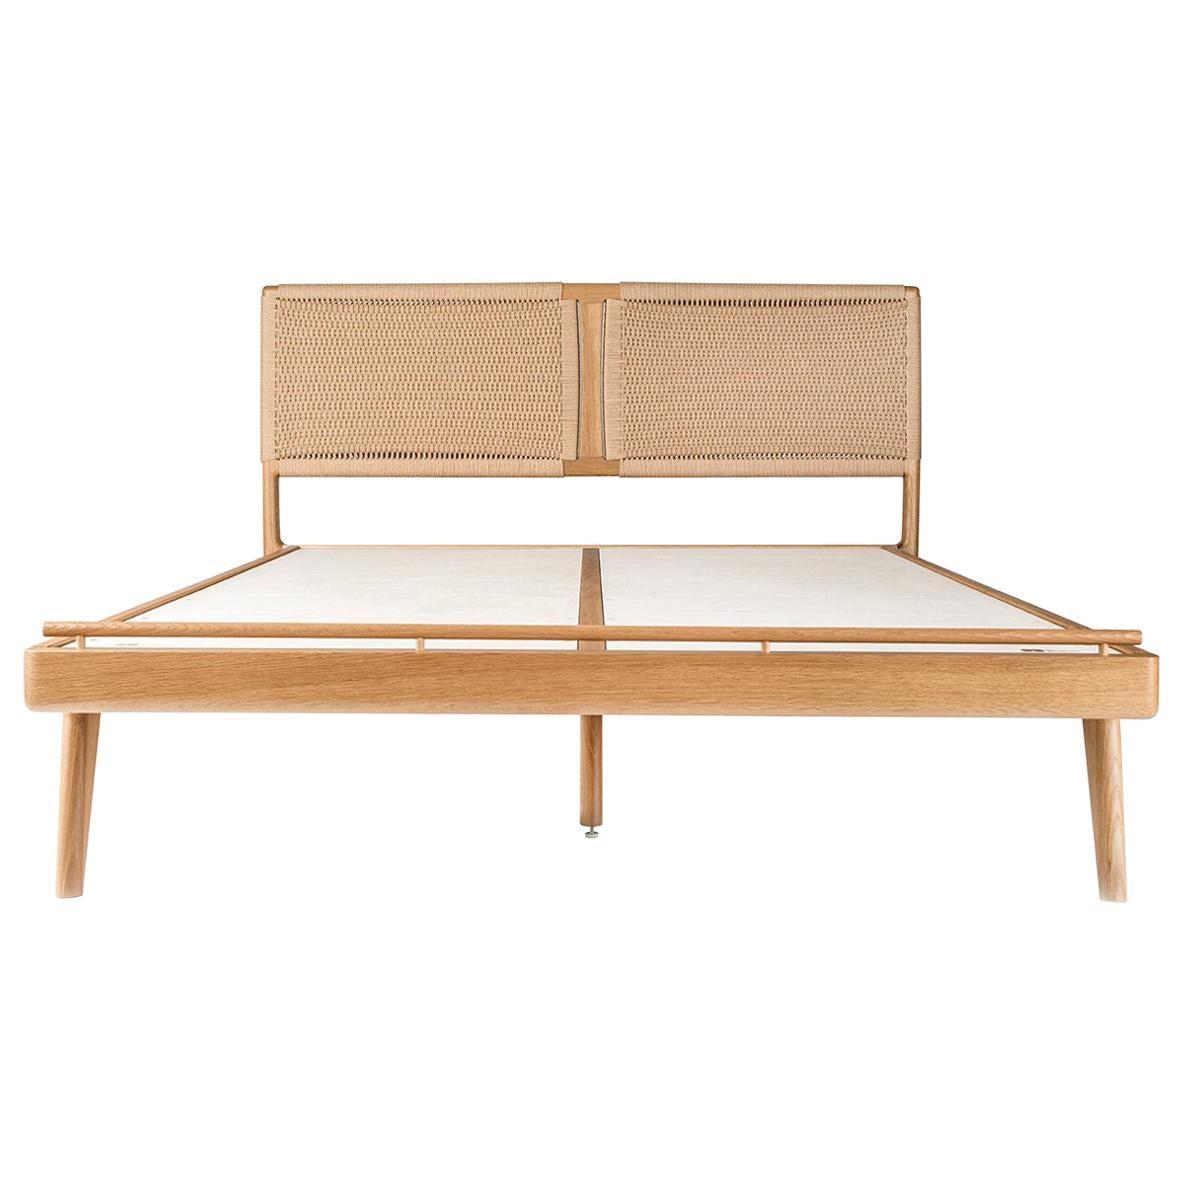 Bed, Queen, Danish cord, Woven, Headboard, Mid Century Modern-Style, Hardwood